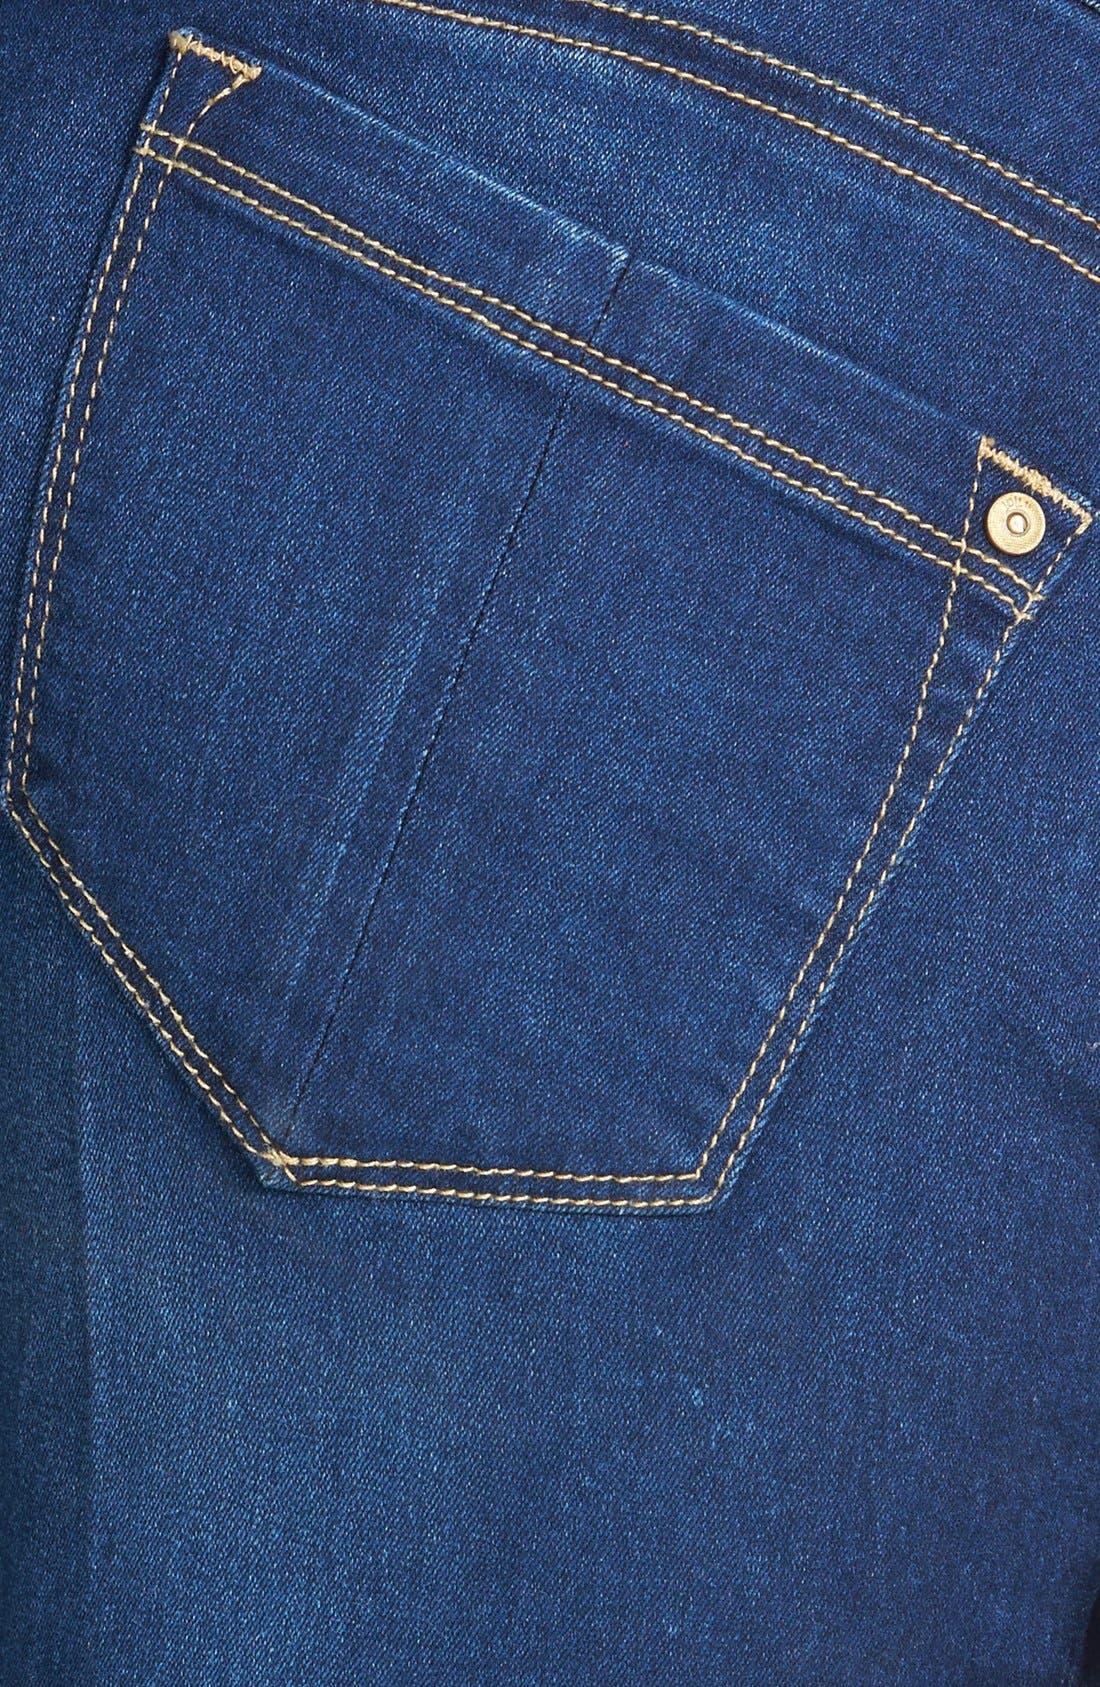 Alternate Image 3  - Jolt Mid-Rise Skinny Jeans (Dark)